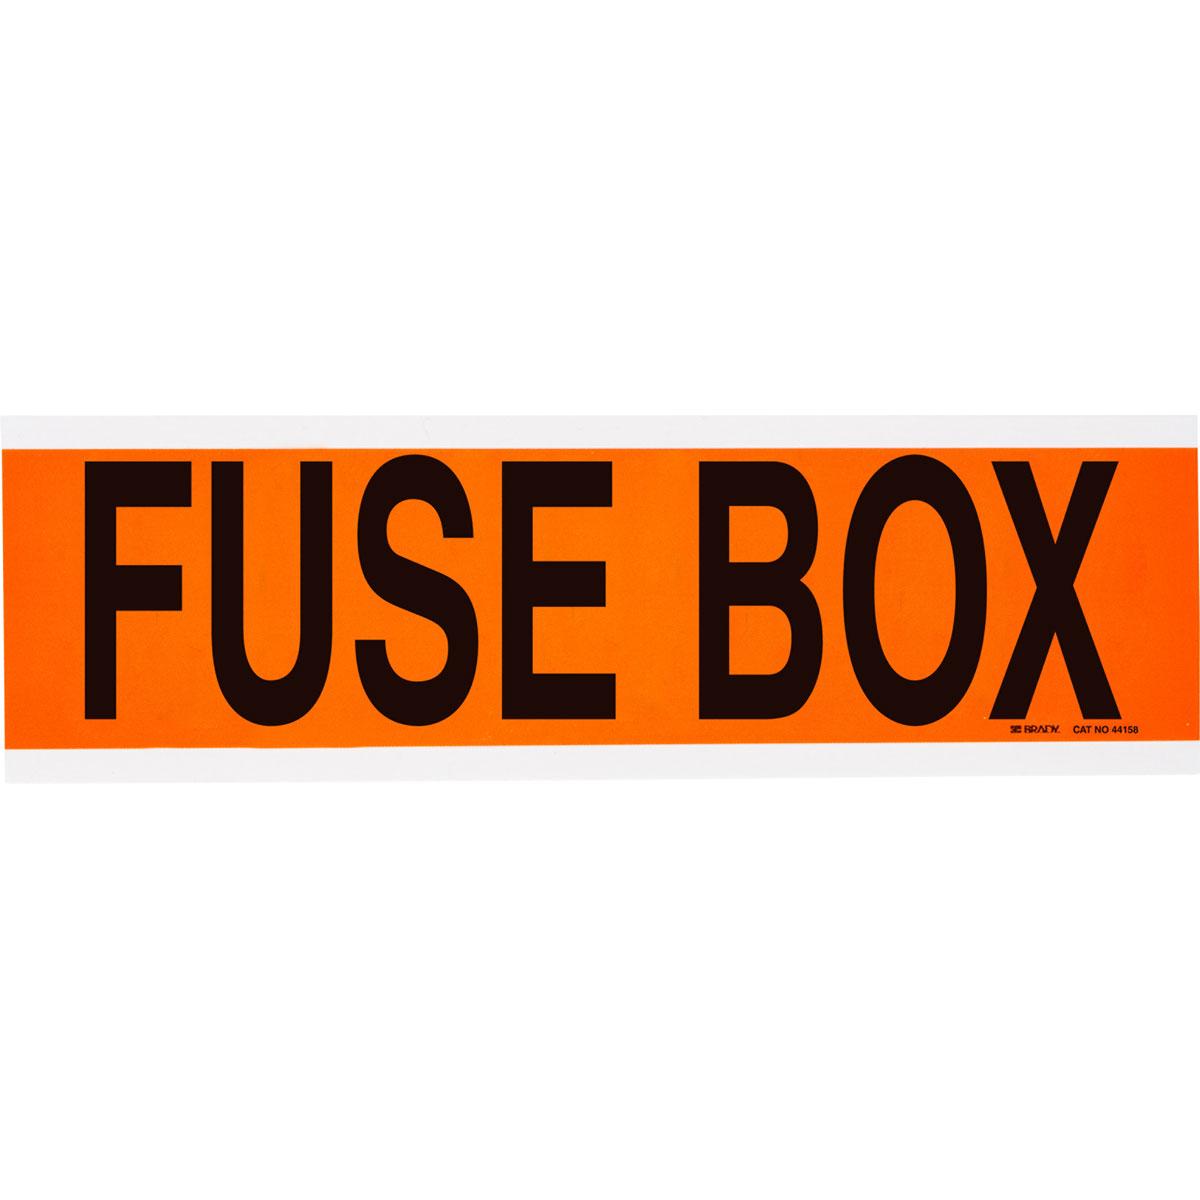 fuse box label wsb awosurk de \u2022brady part 44158 fuse box label bradyid com rh bradyid com 1999 ford f150 fuse box label 2000 honda civic fuse box label